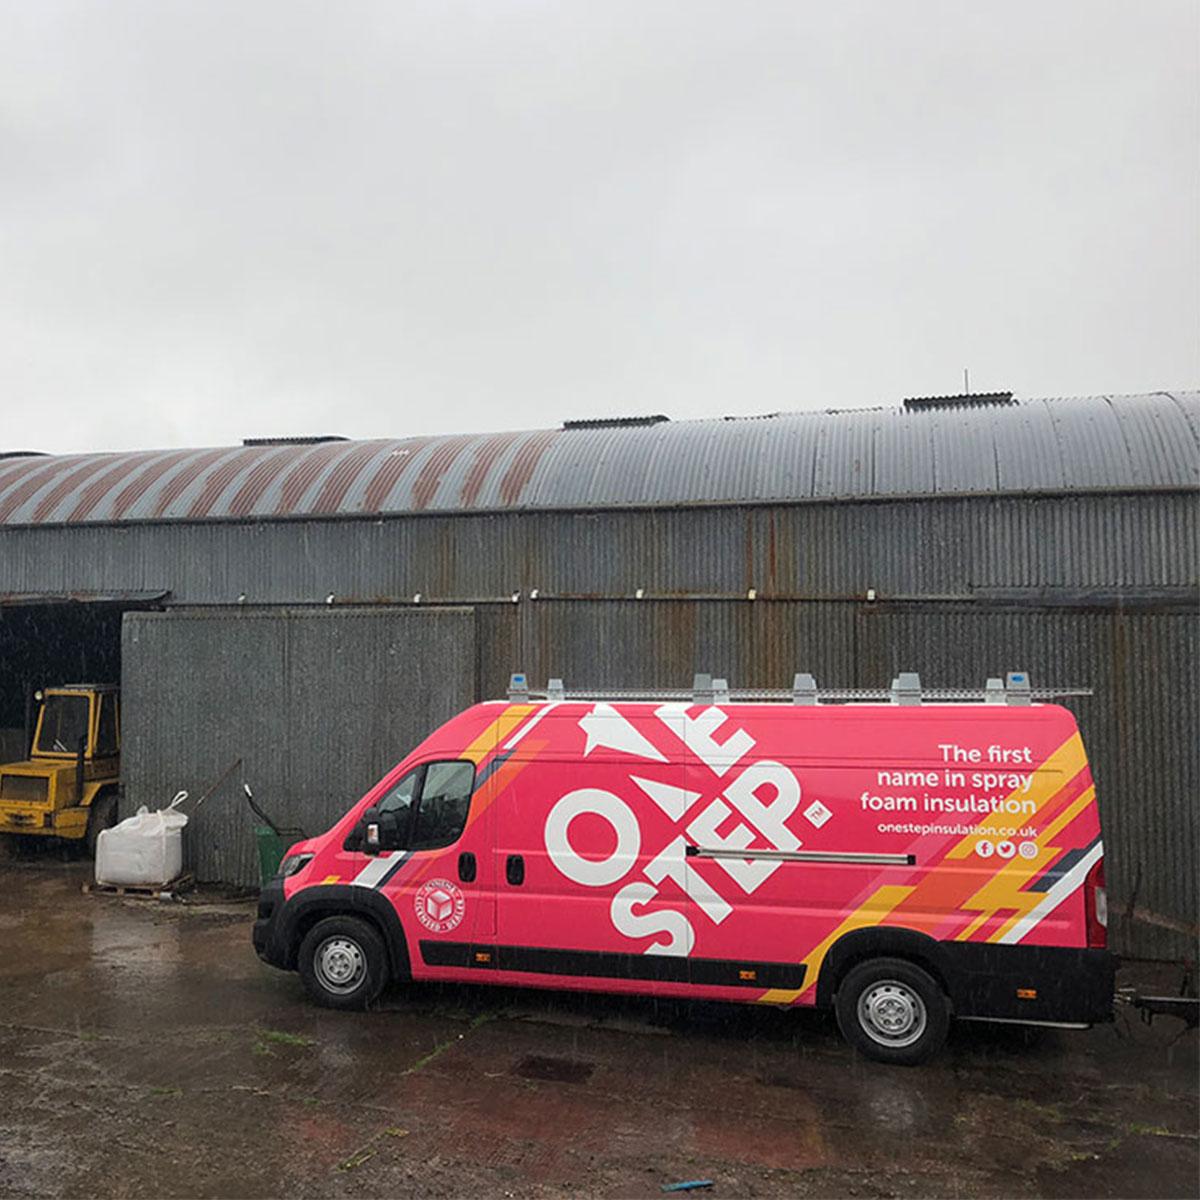 Our Spray Foam - One Step Insulation